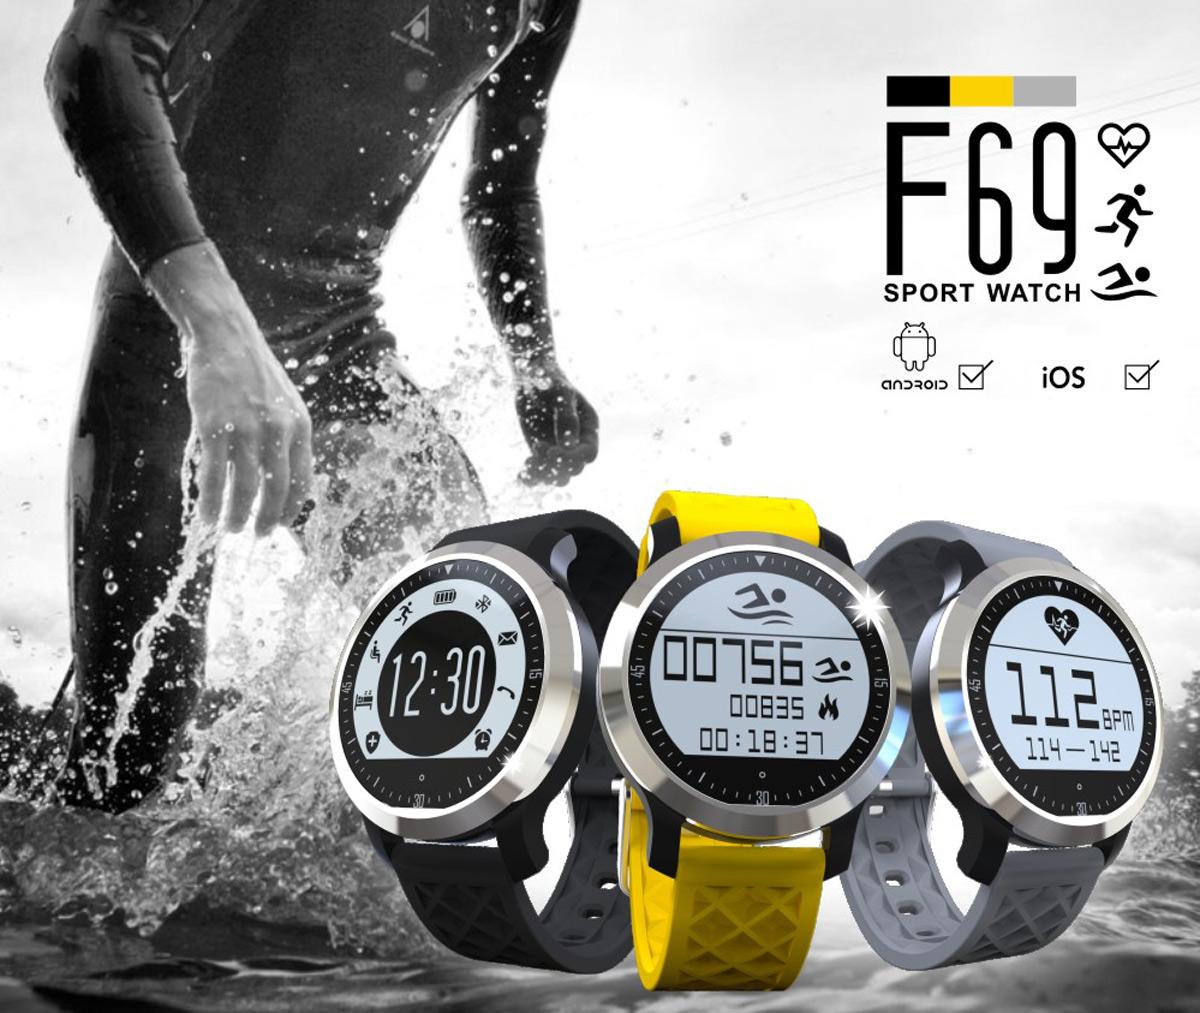 F69 Smart BT Swimming Watch on Flash Sale